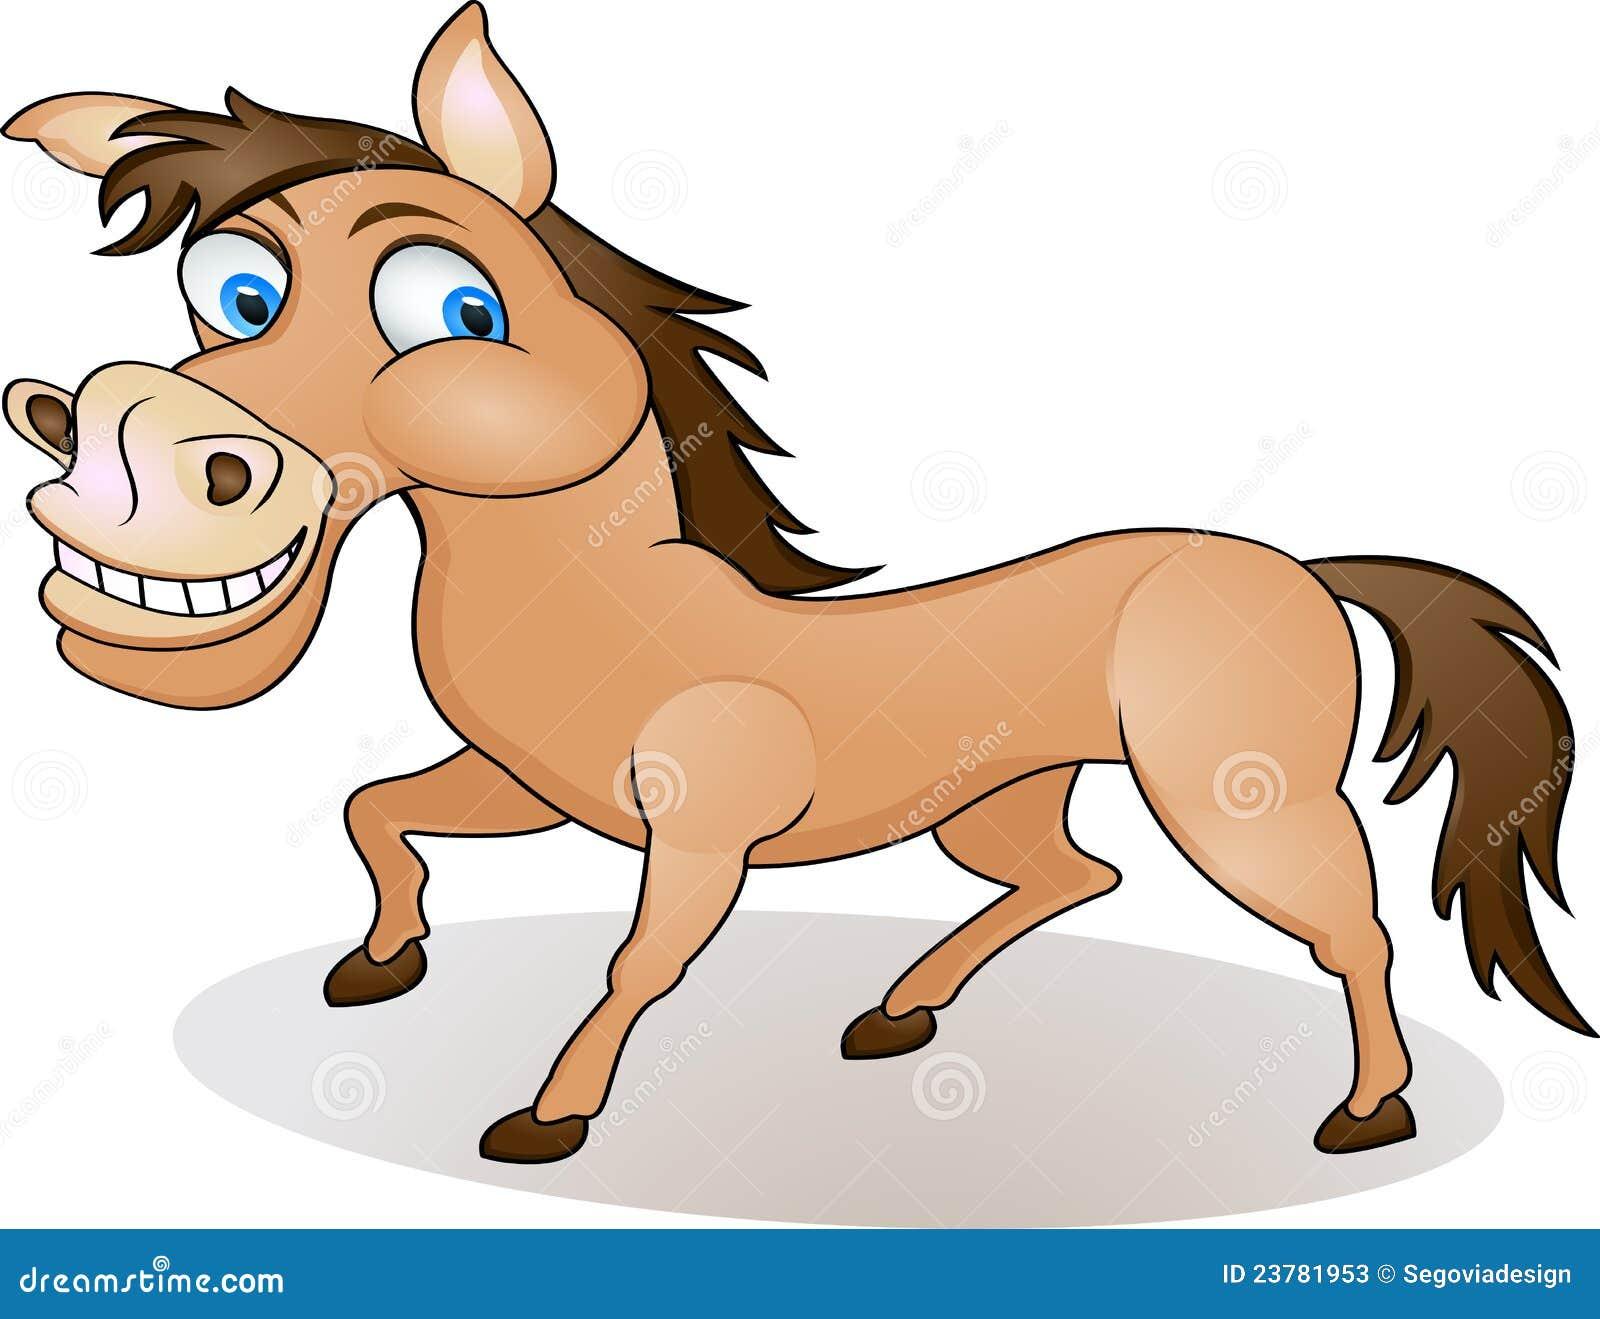 Funny Horse Cartoon Stock Vector Illustration Of Witty 23781953